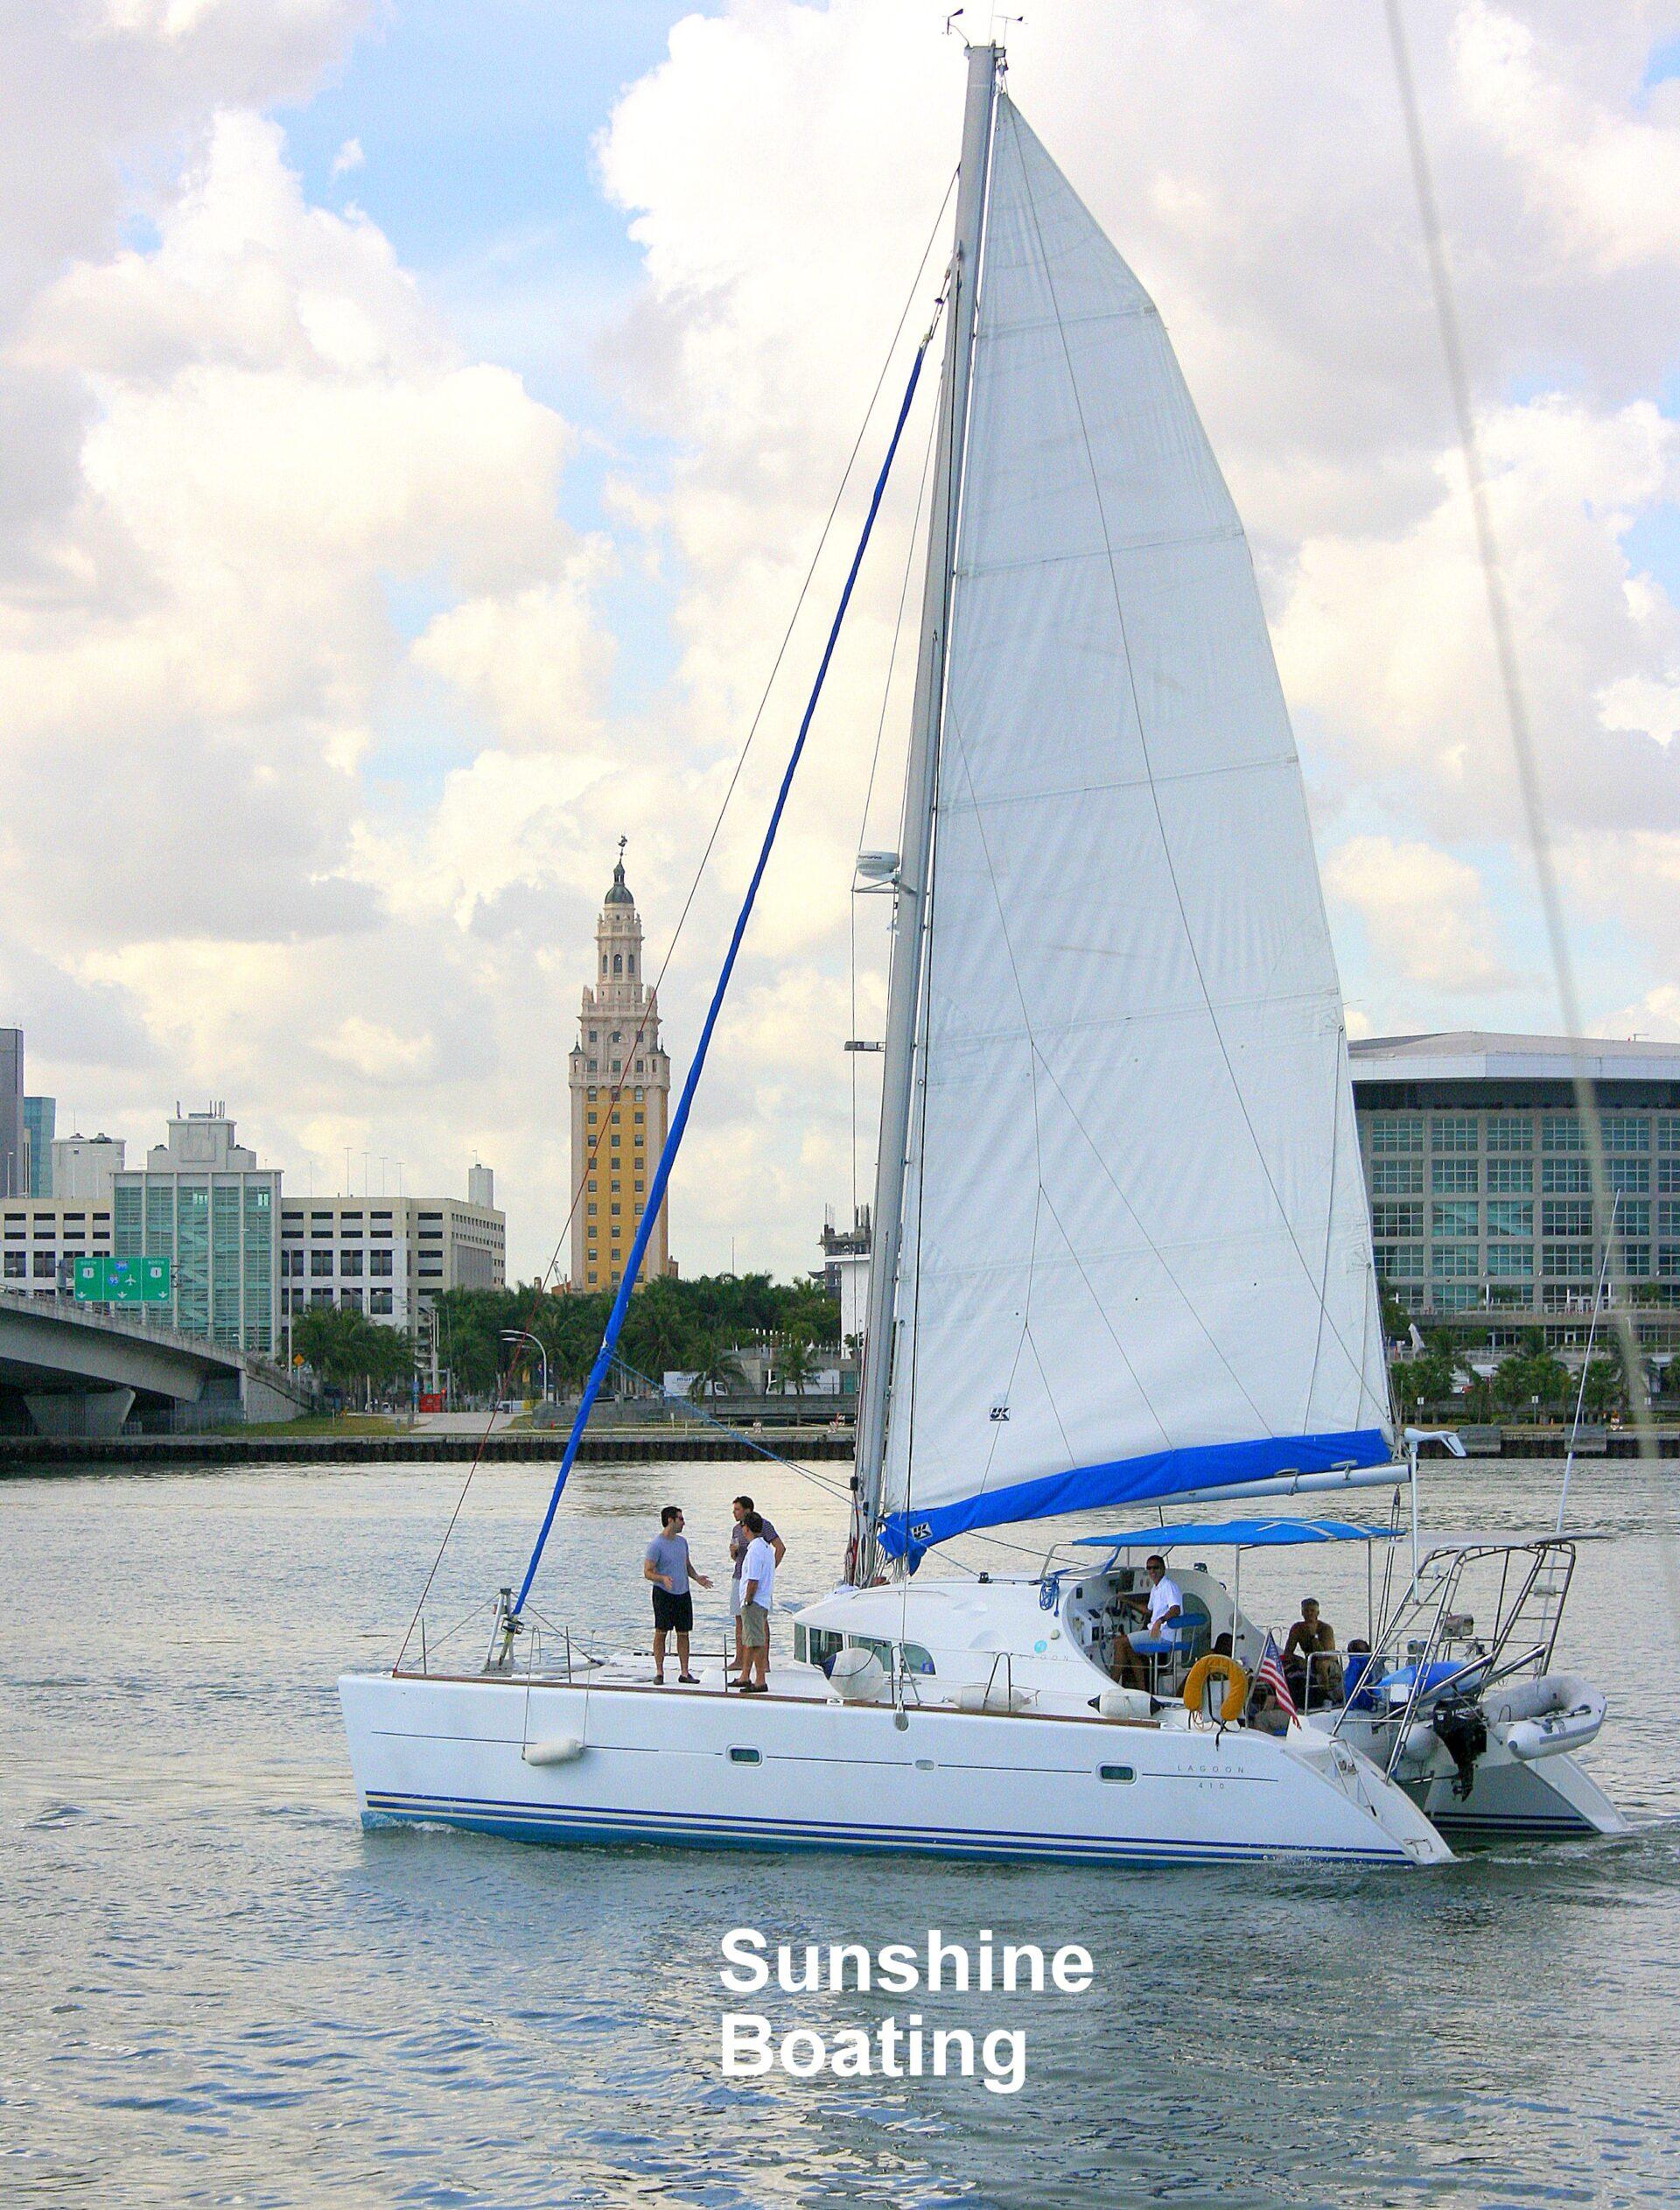 sunshine-boating-lagoon-41-c